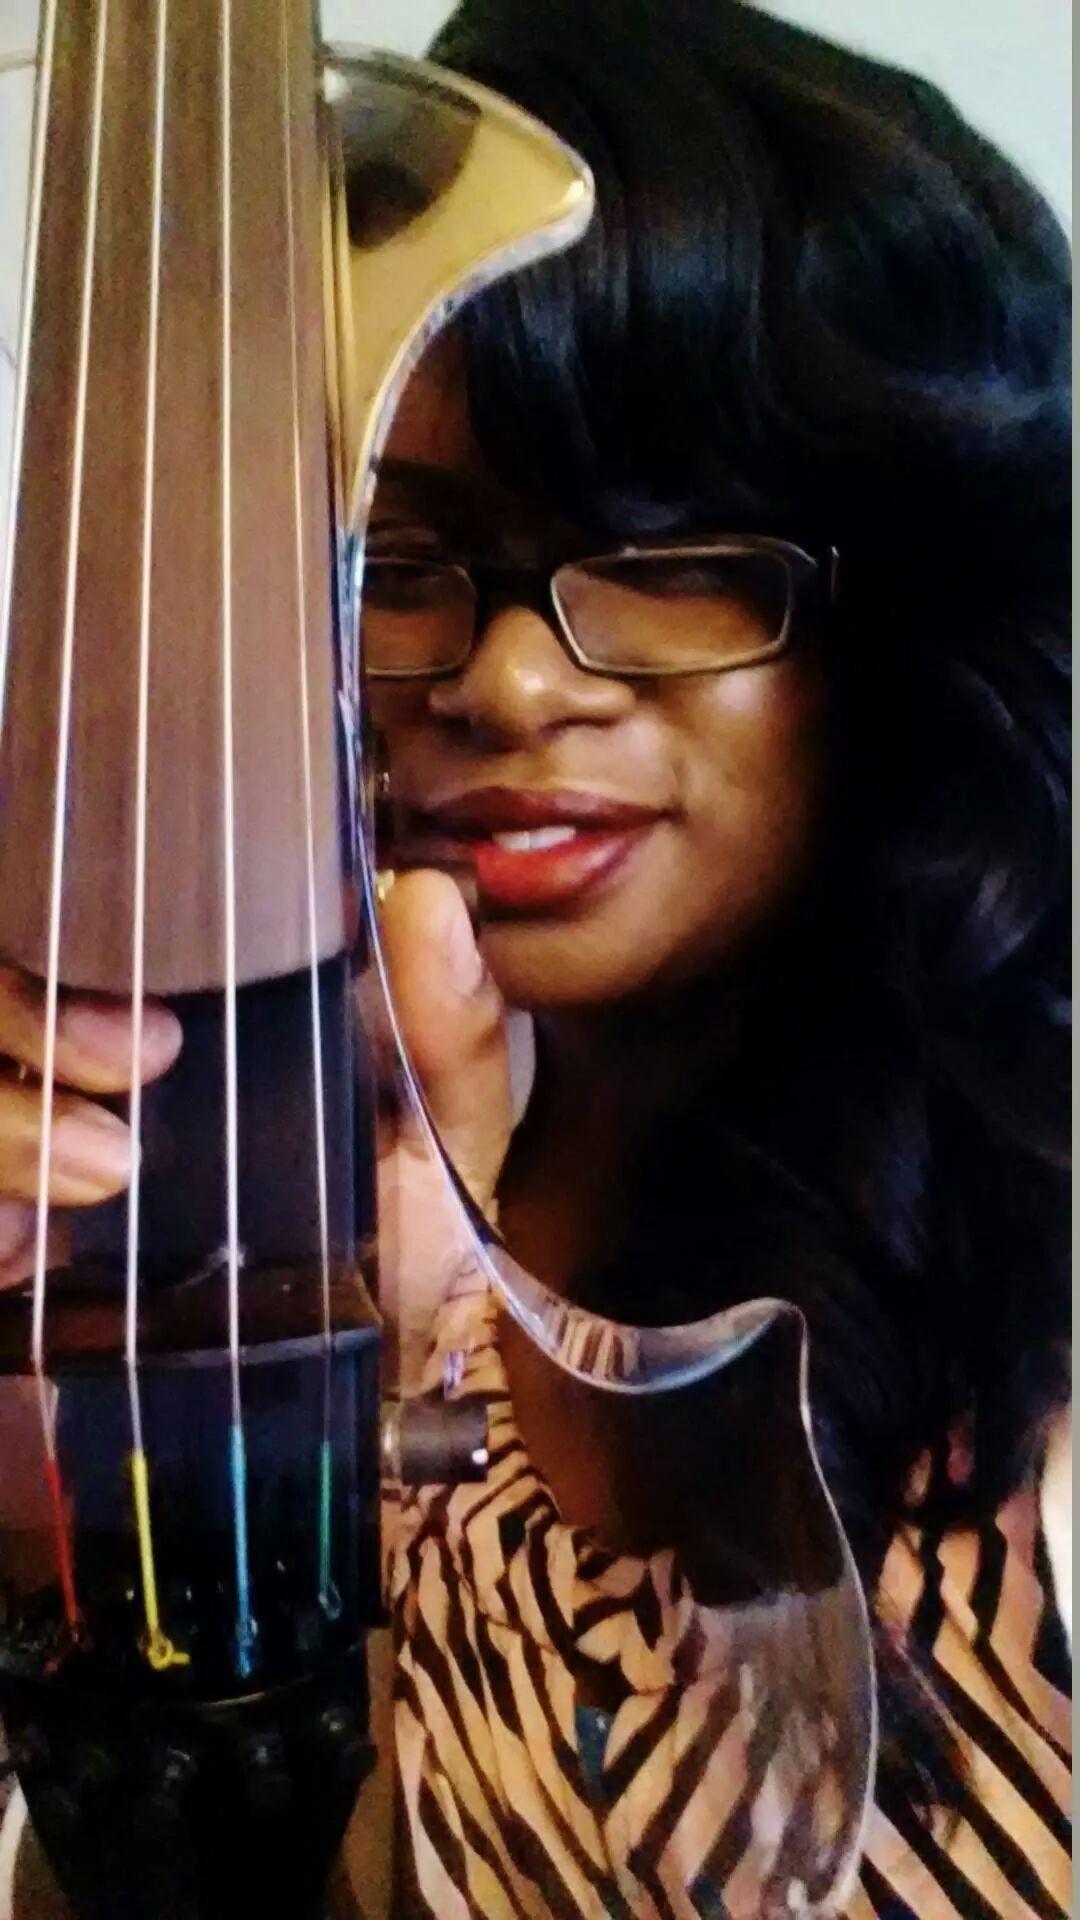 Sai Harley with Glass Electric Violin.jpeg